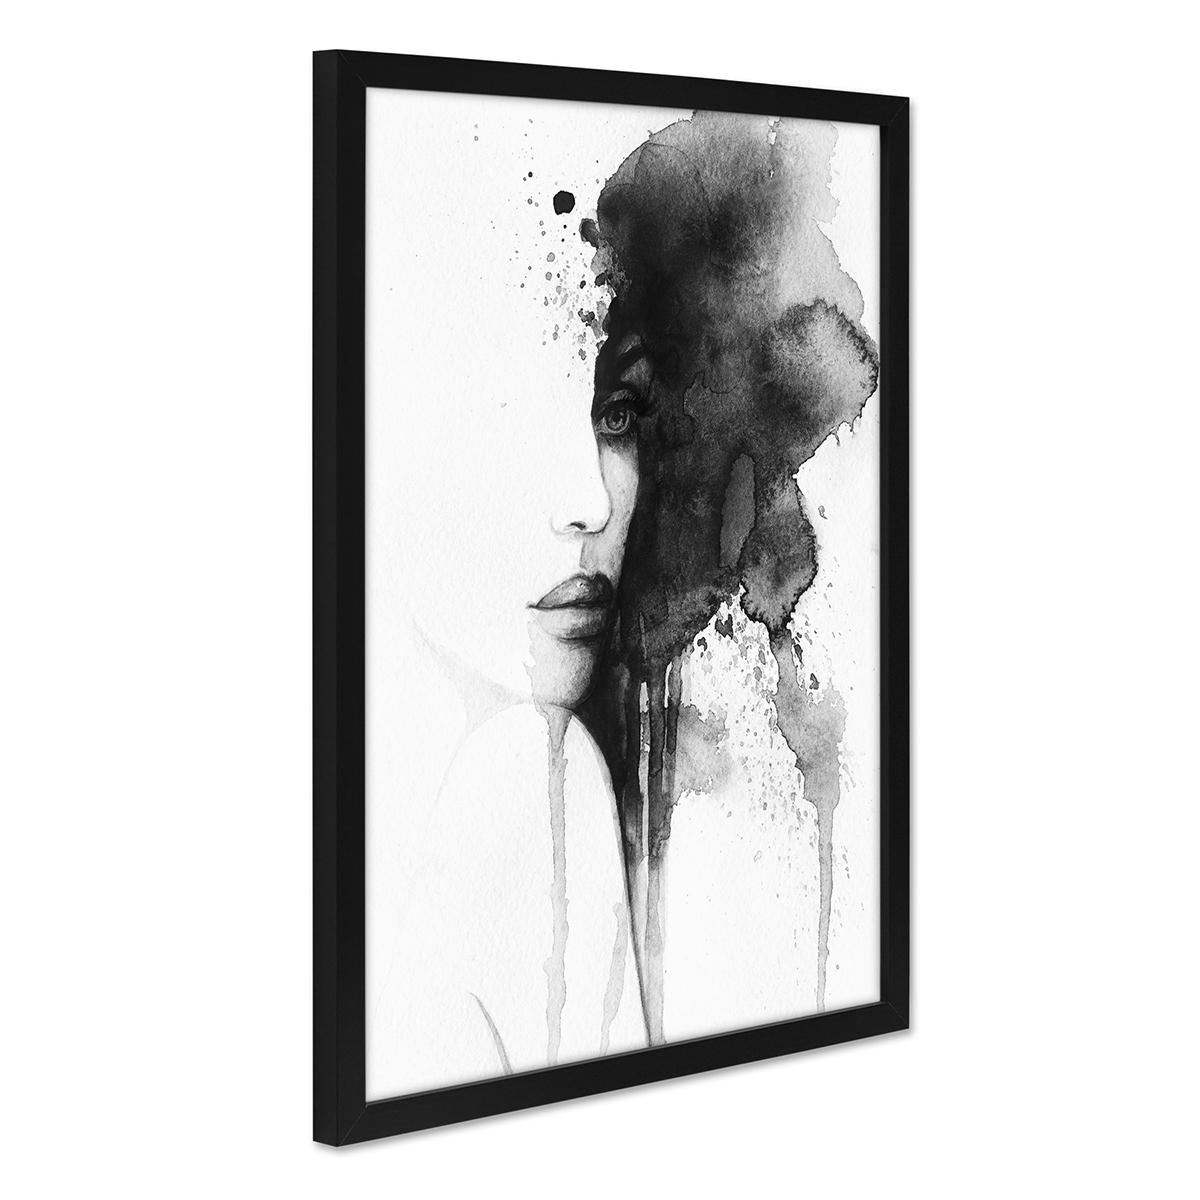 Design-Poster mit Bilderrahmen Schwarz \'Aquarell Frau\' 30x40 cm ...